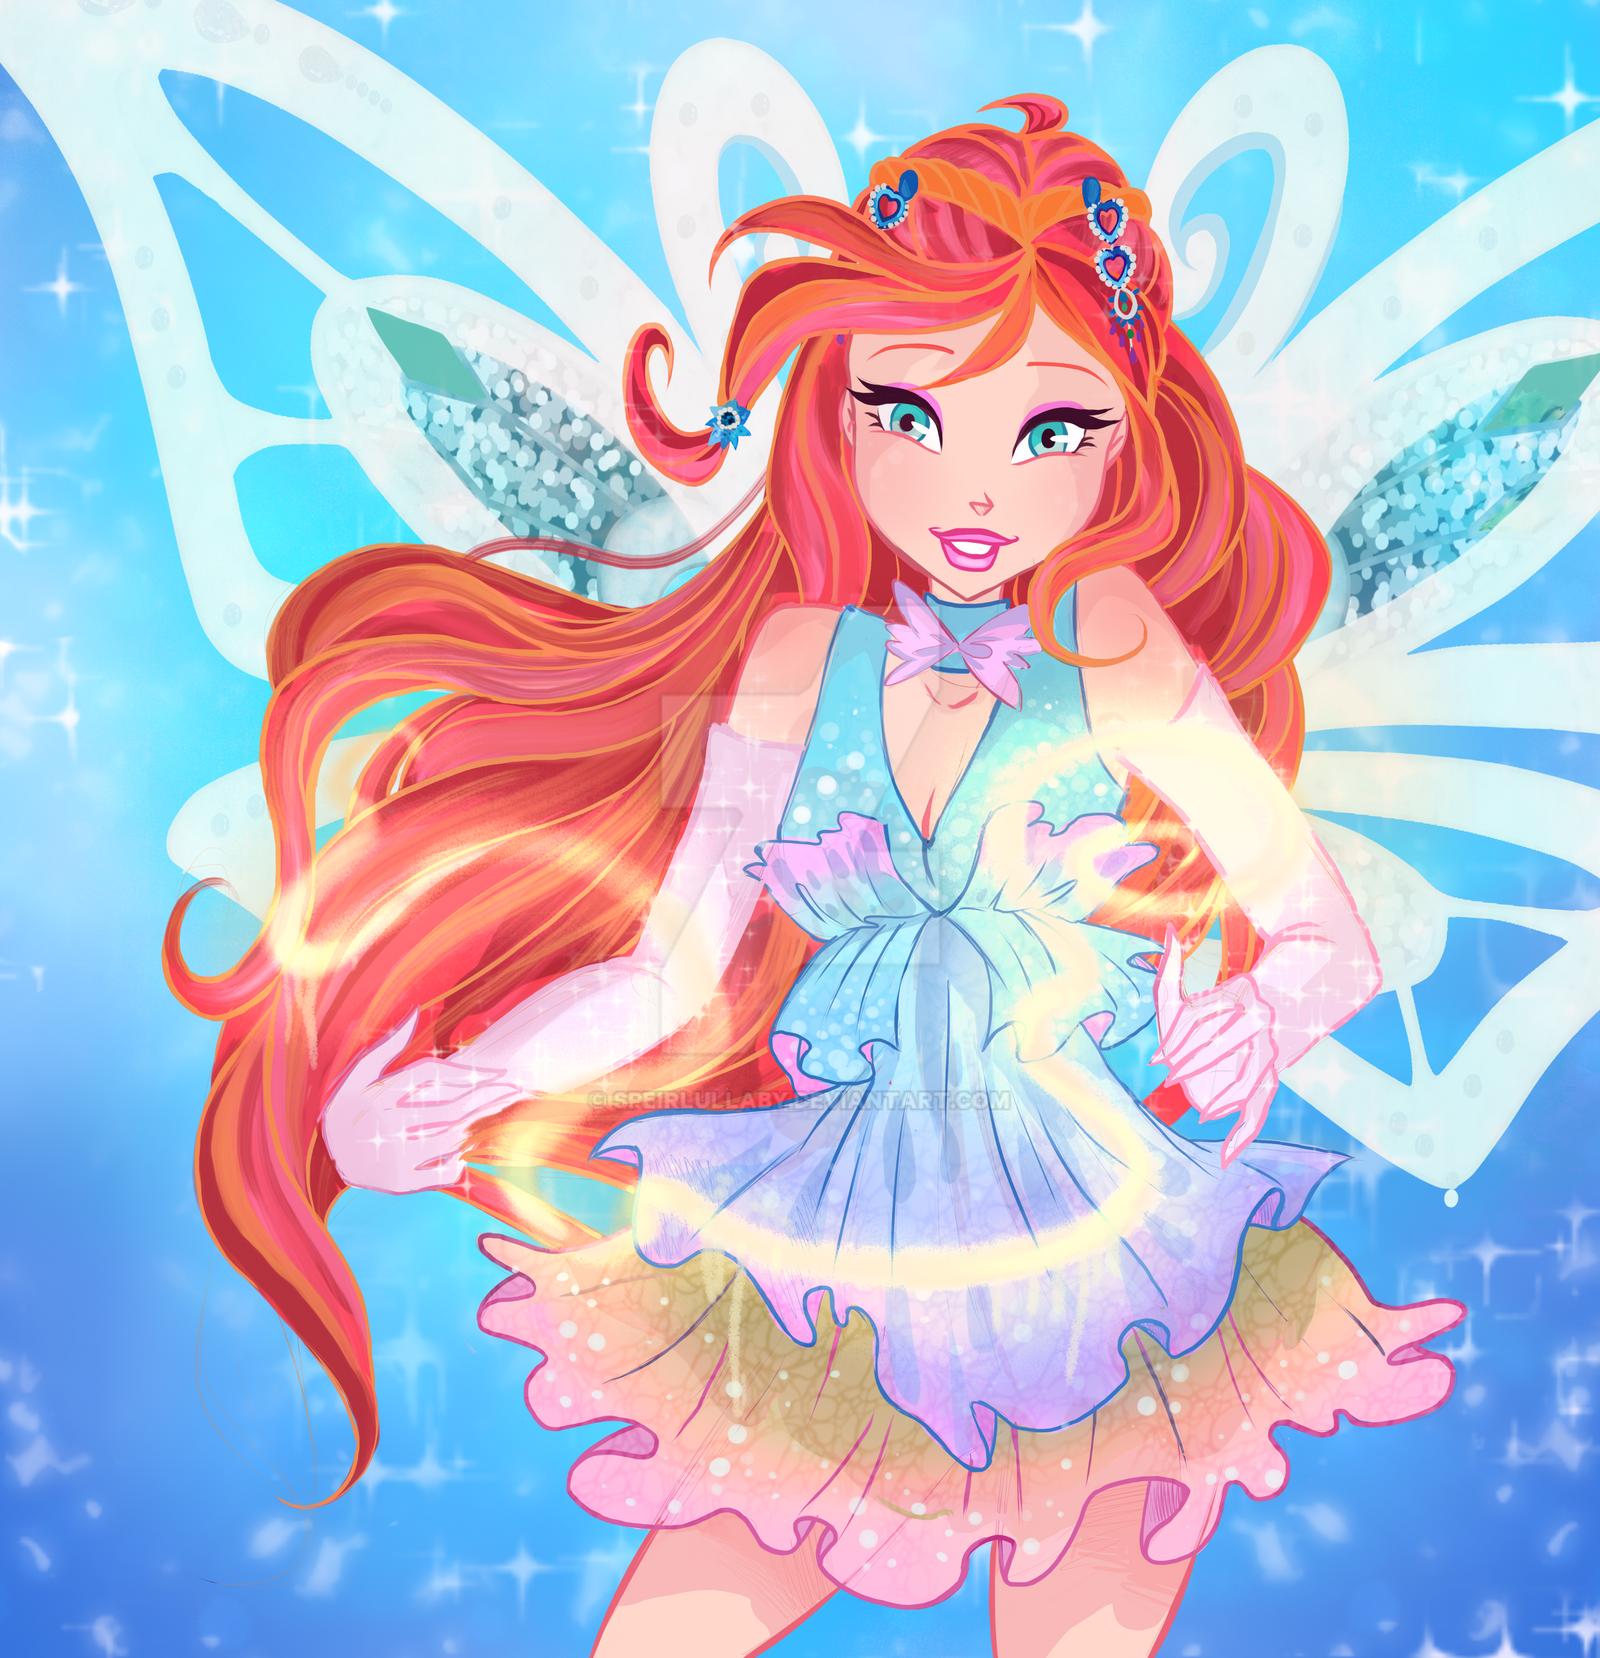 Bloom enchantix by speirlullaby on deviantart - Winx club bloom enchantix ...